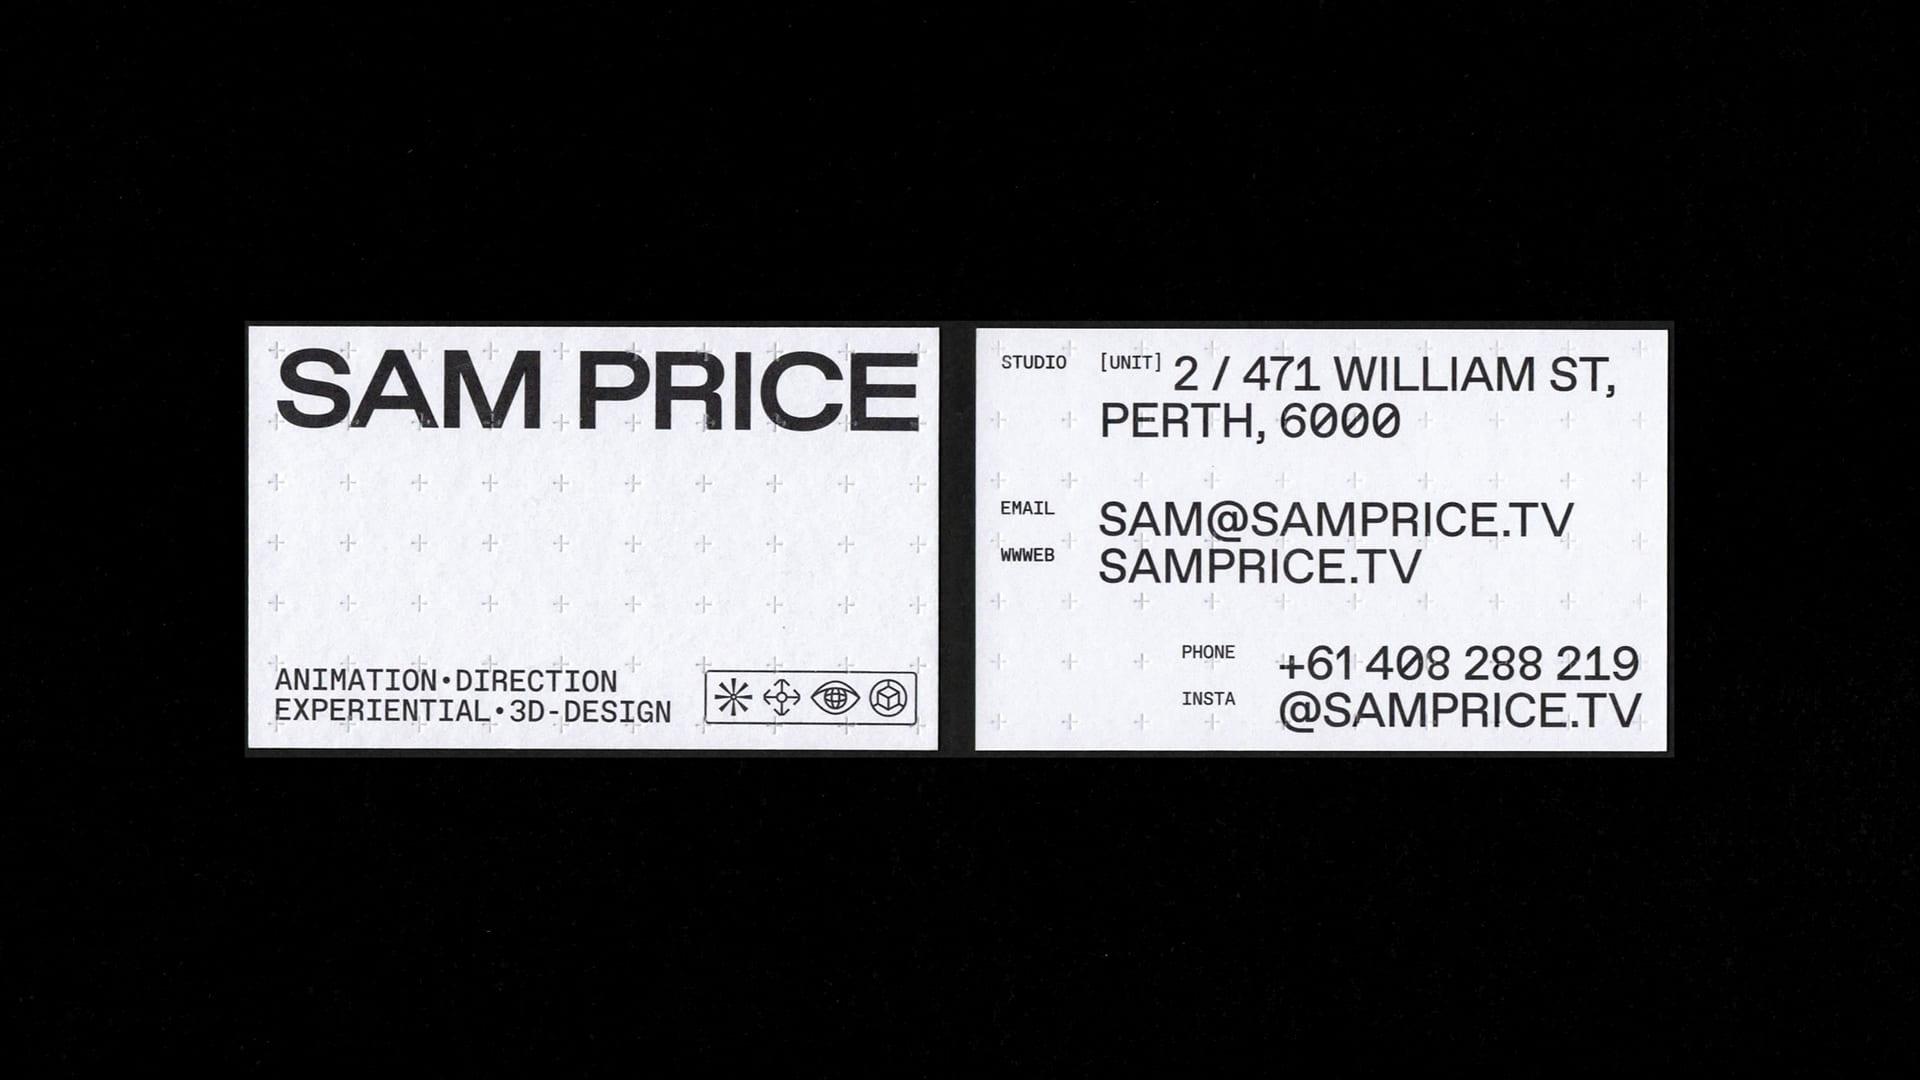 Sam-Price_WebCaseStudy_2-2